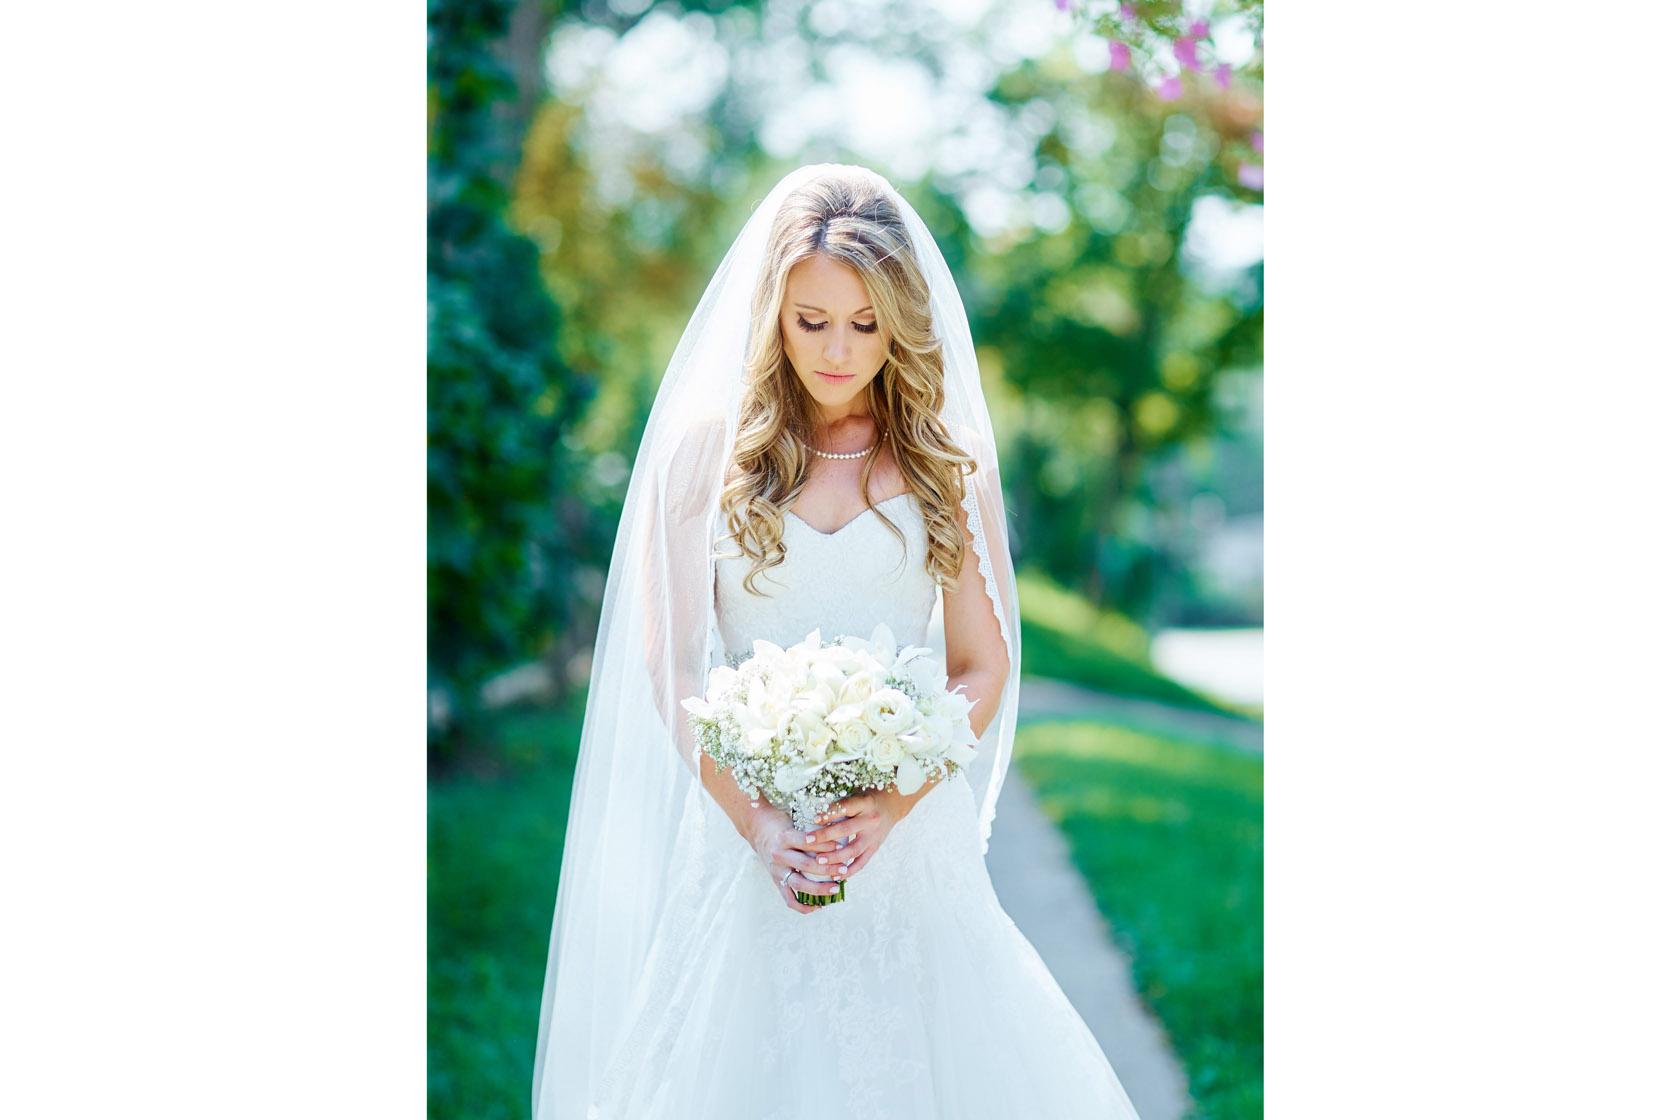 stephen sager photography 2198 toronto wedding photography